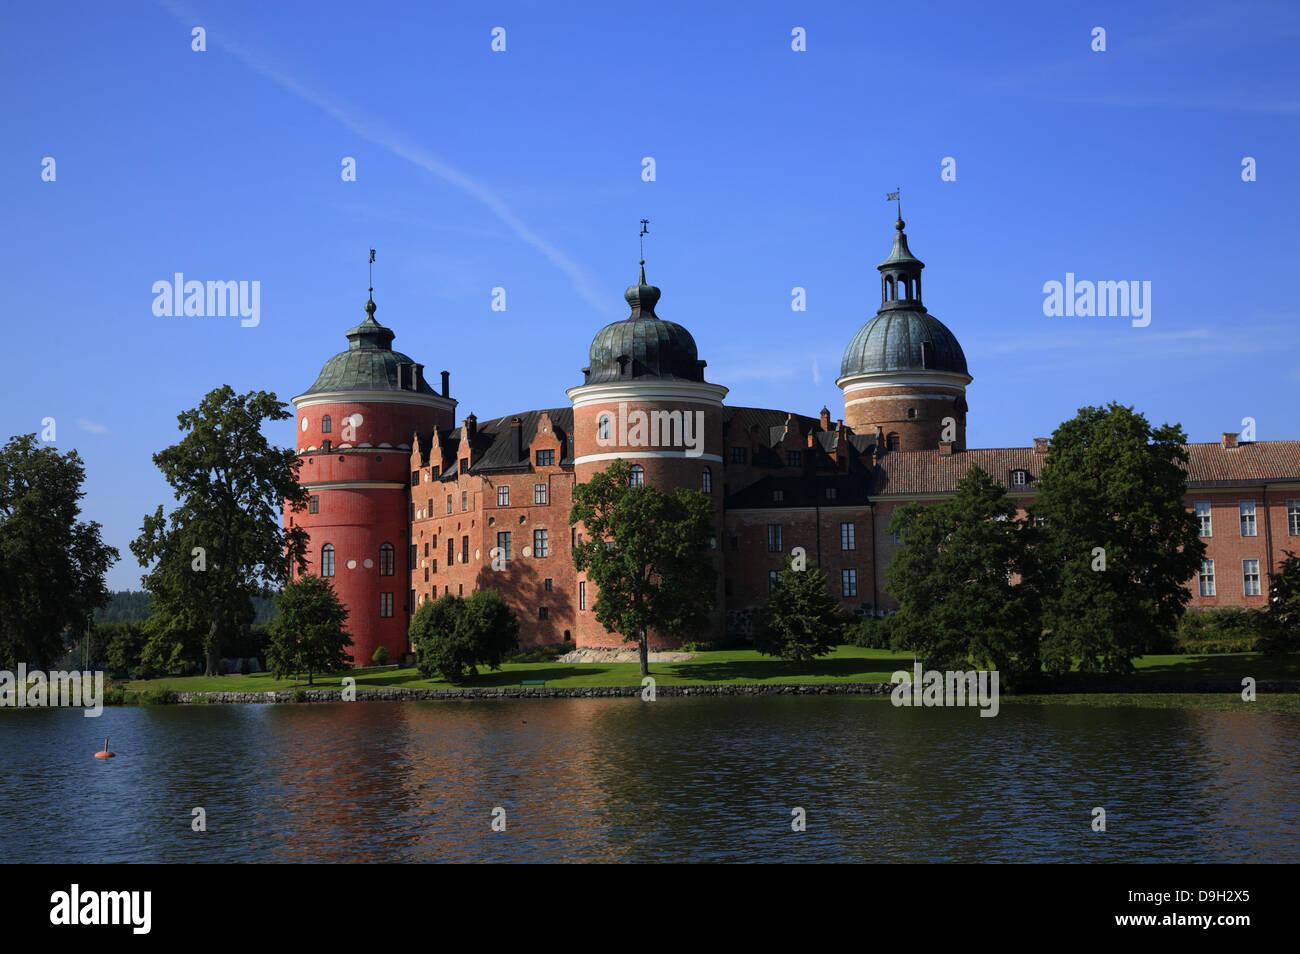 GRIPSHOLM Castle at lake Malaren, Mariefred, Sodermanland, Sweden, Scandinavia - Stock Image